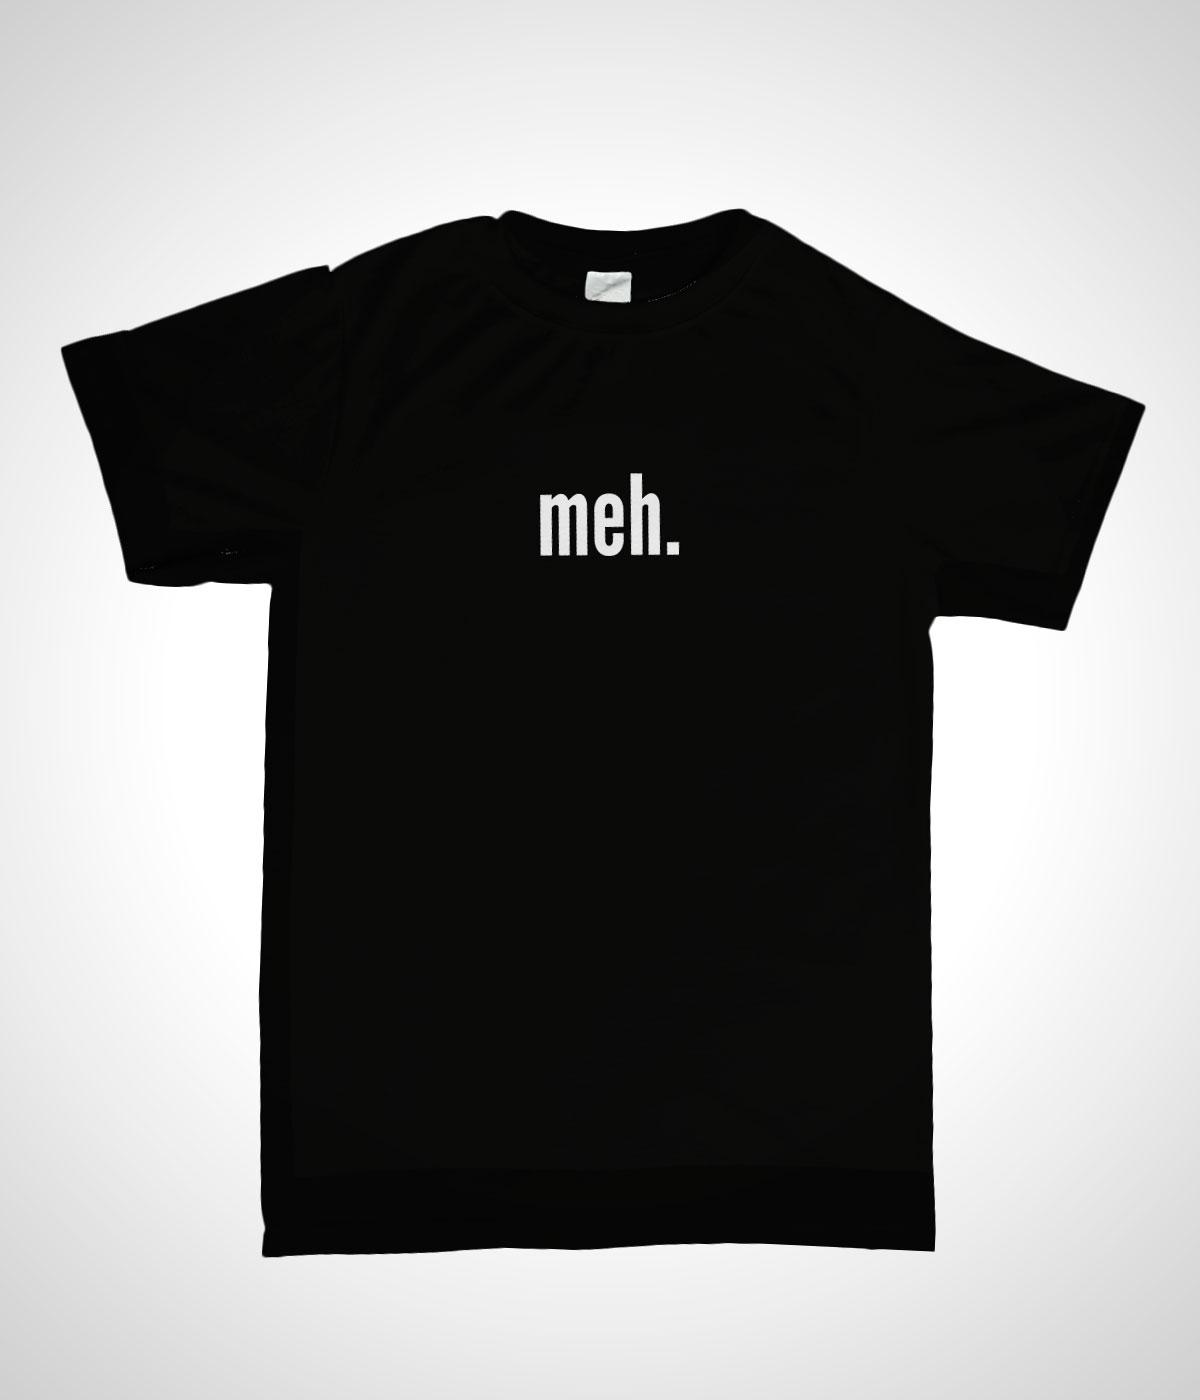 52e63fdb4 meh T-Shirt